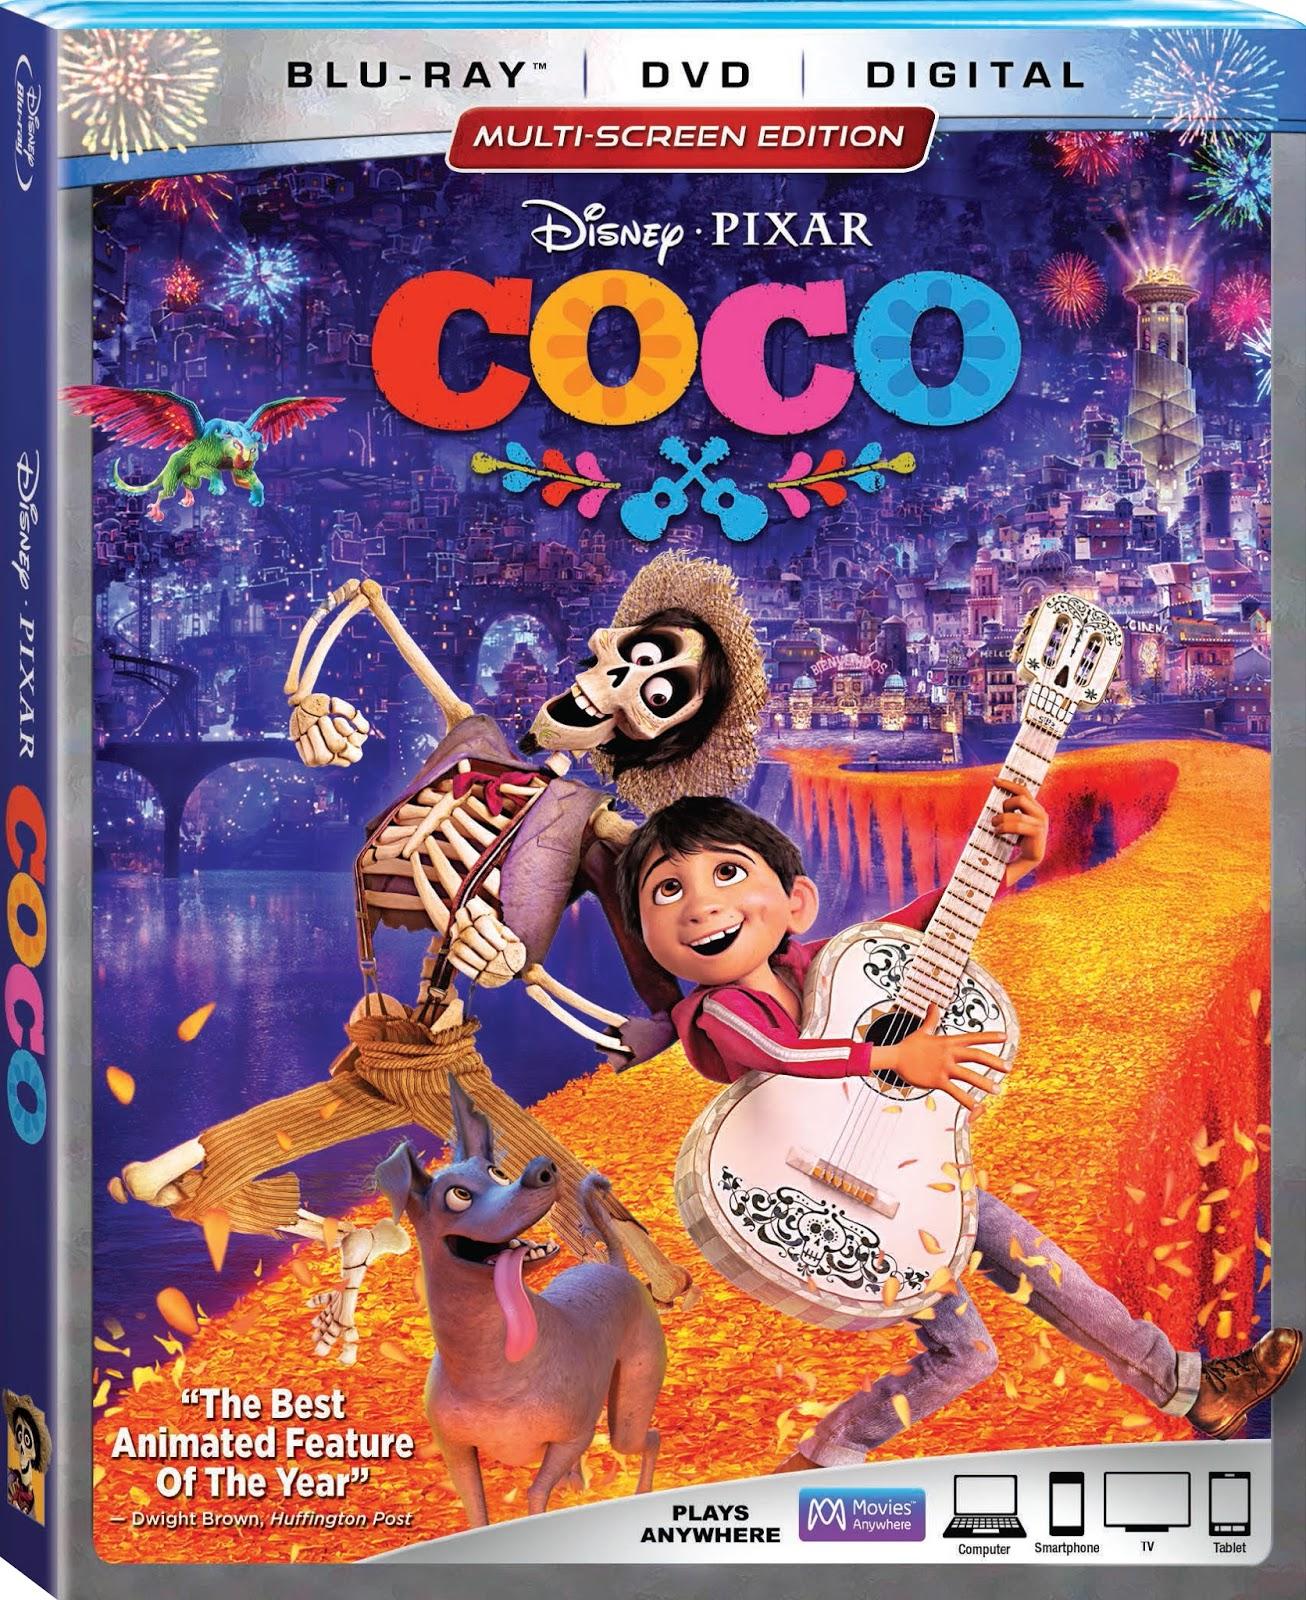 Coco Blu Ray Box Art